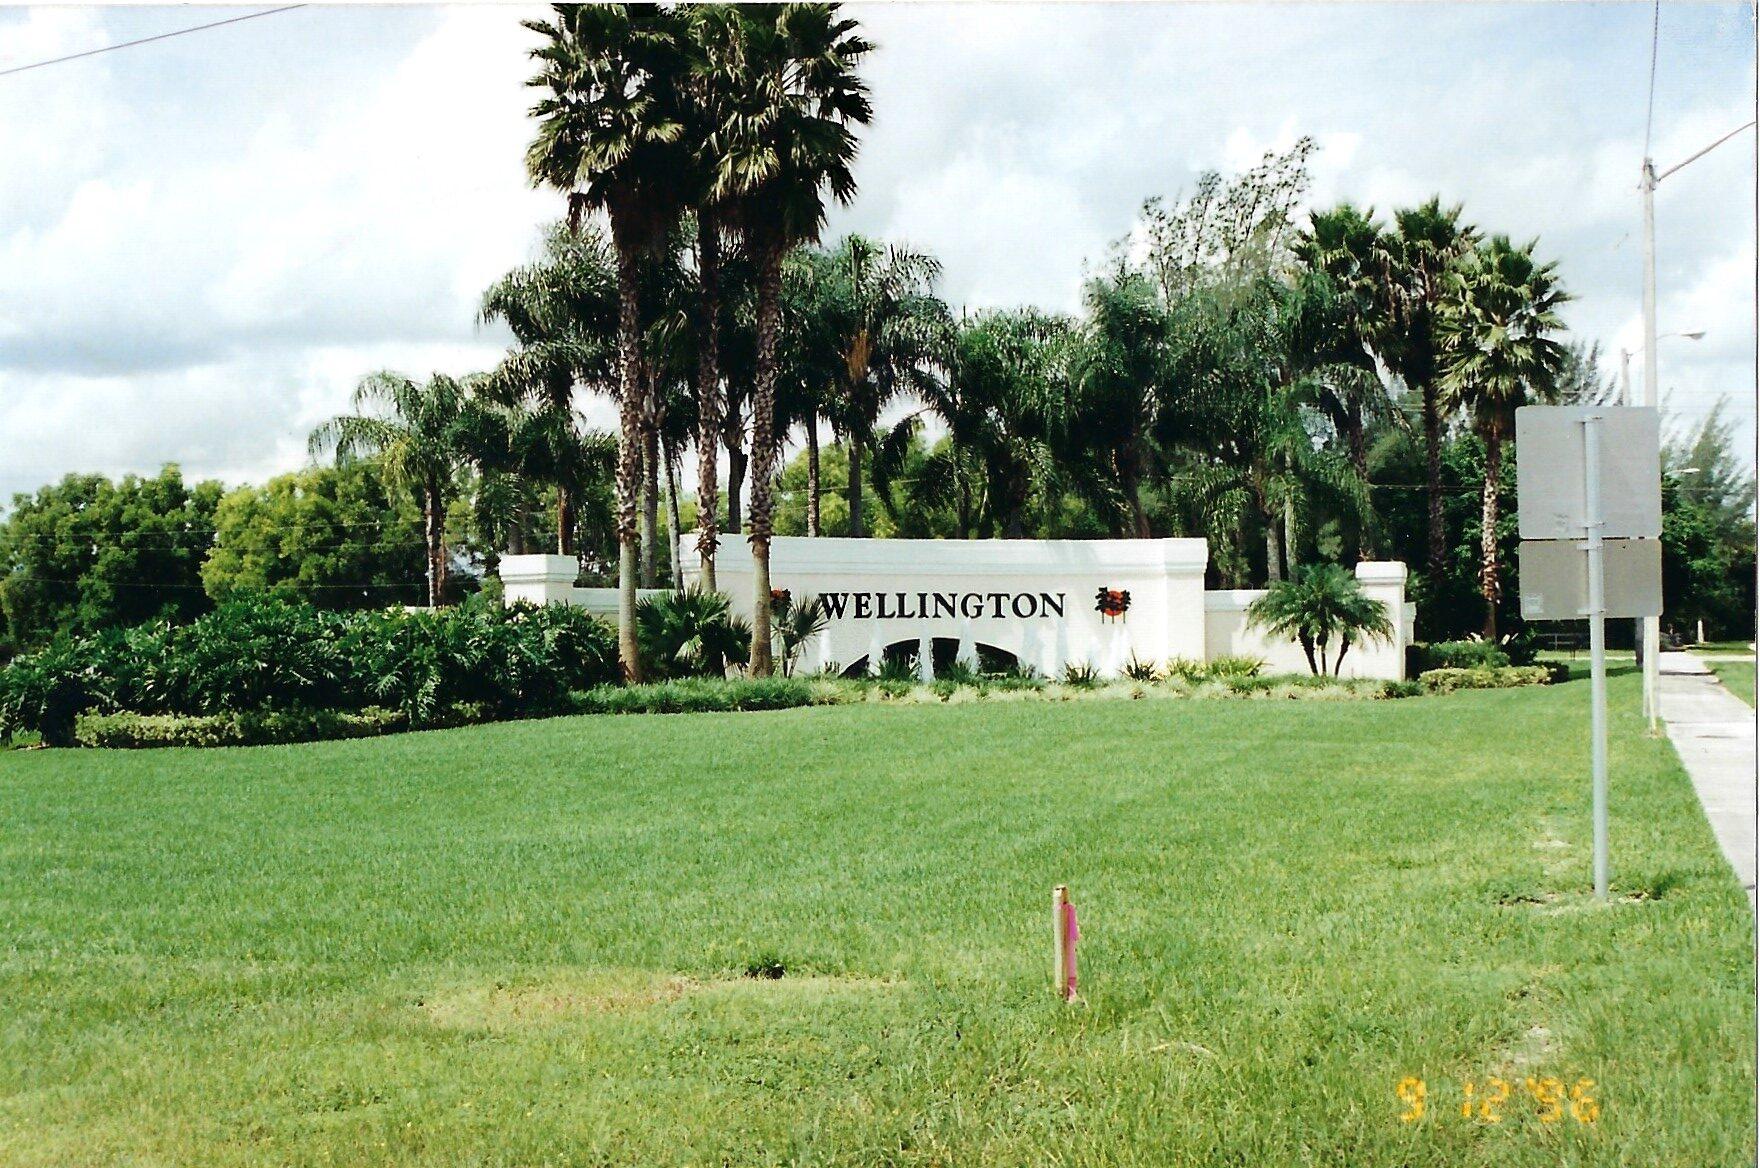 Wellington Village Sign